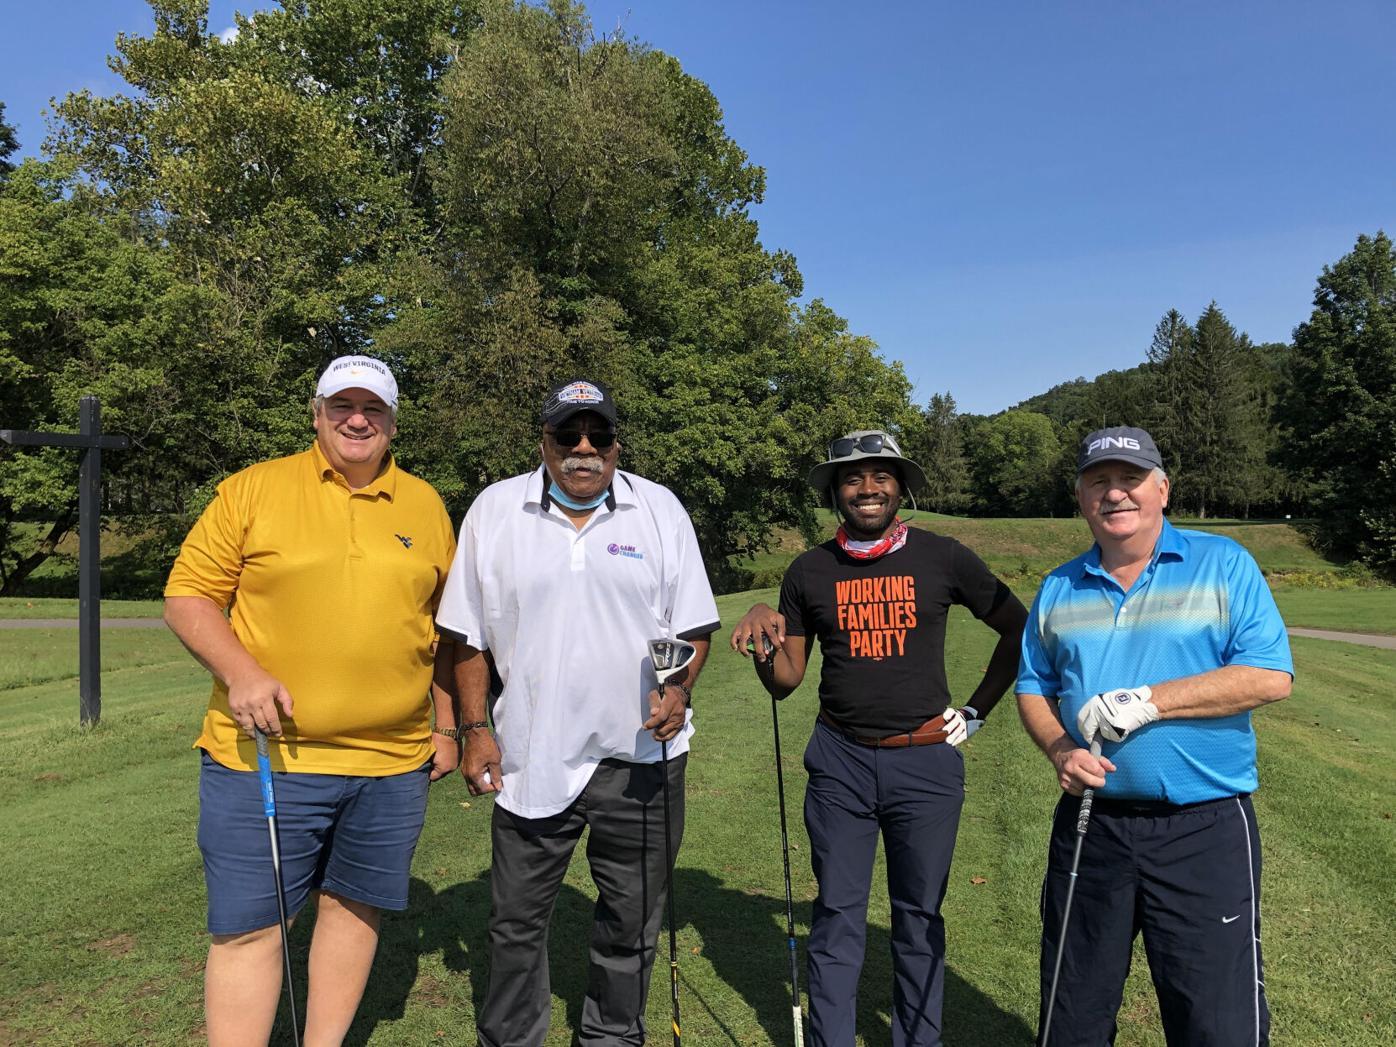 Black Heritage Festival golf group